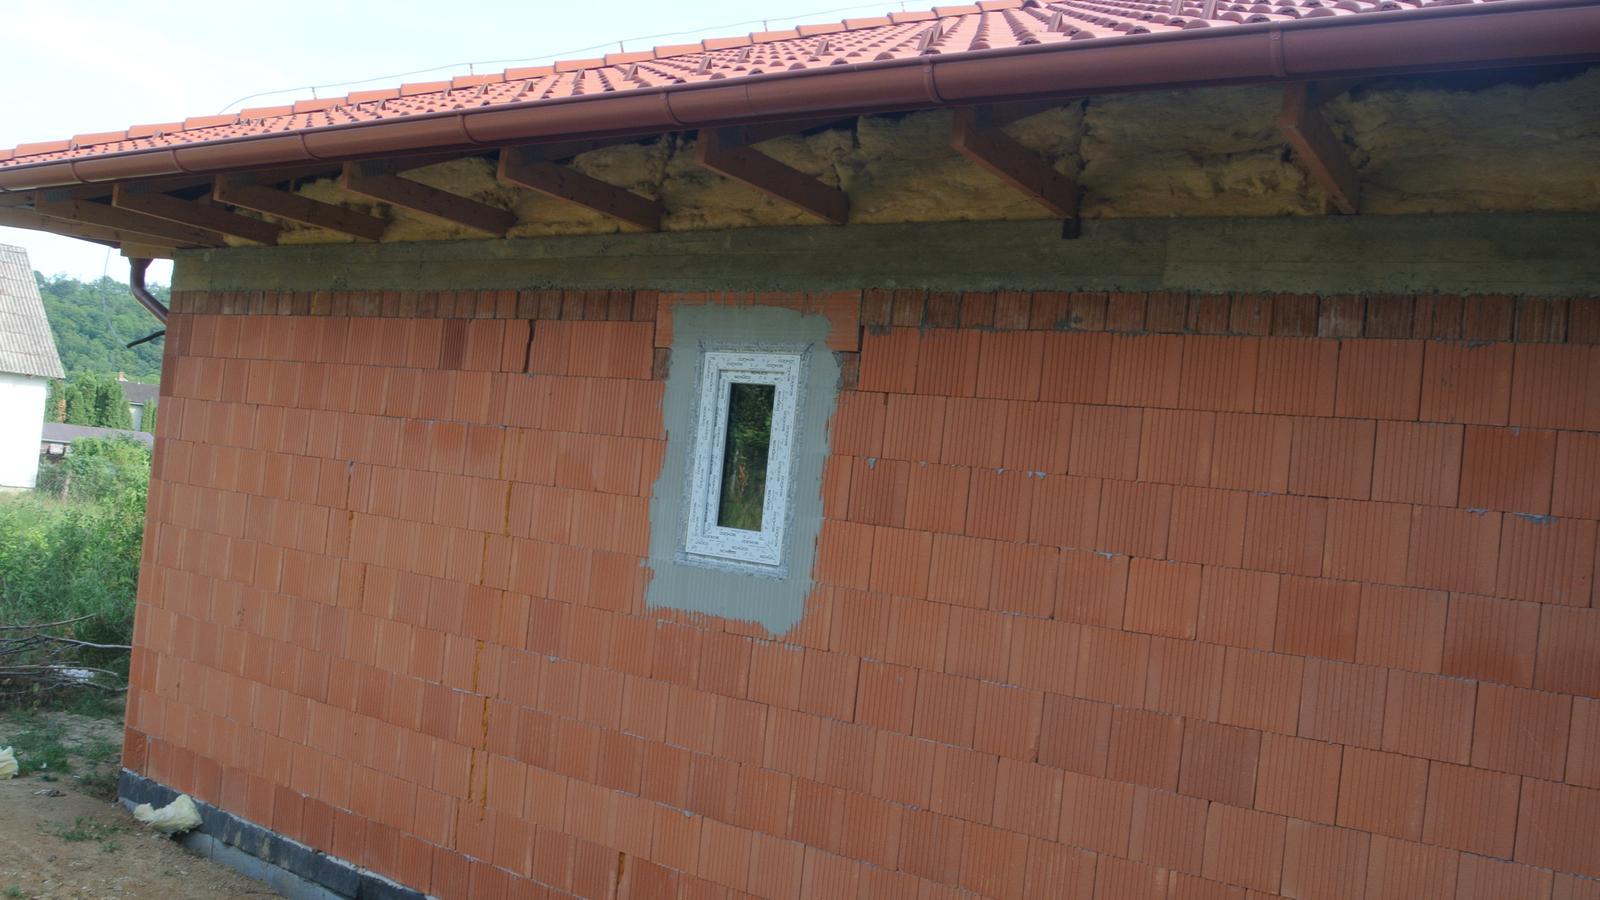 A bude domček ... - Pohľad od severu-severovýchodu, jediné okienko na kumbále.